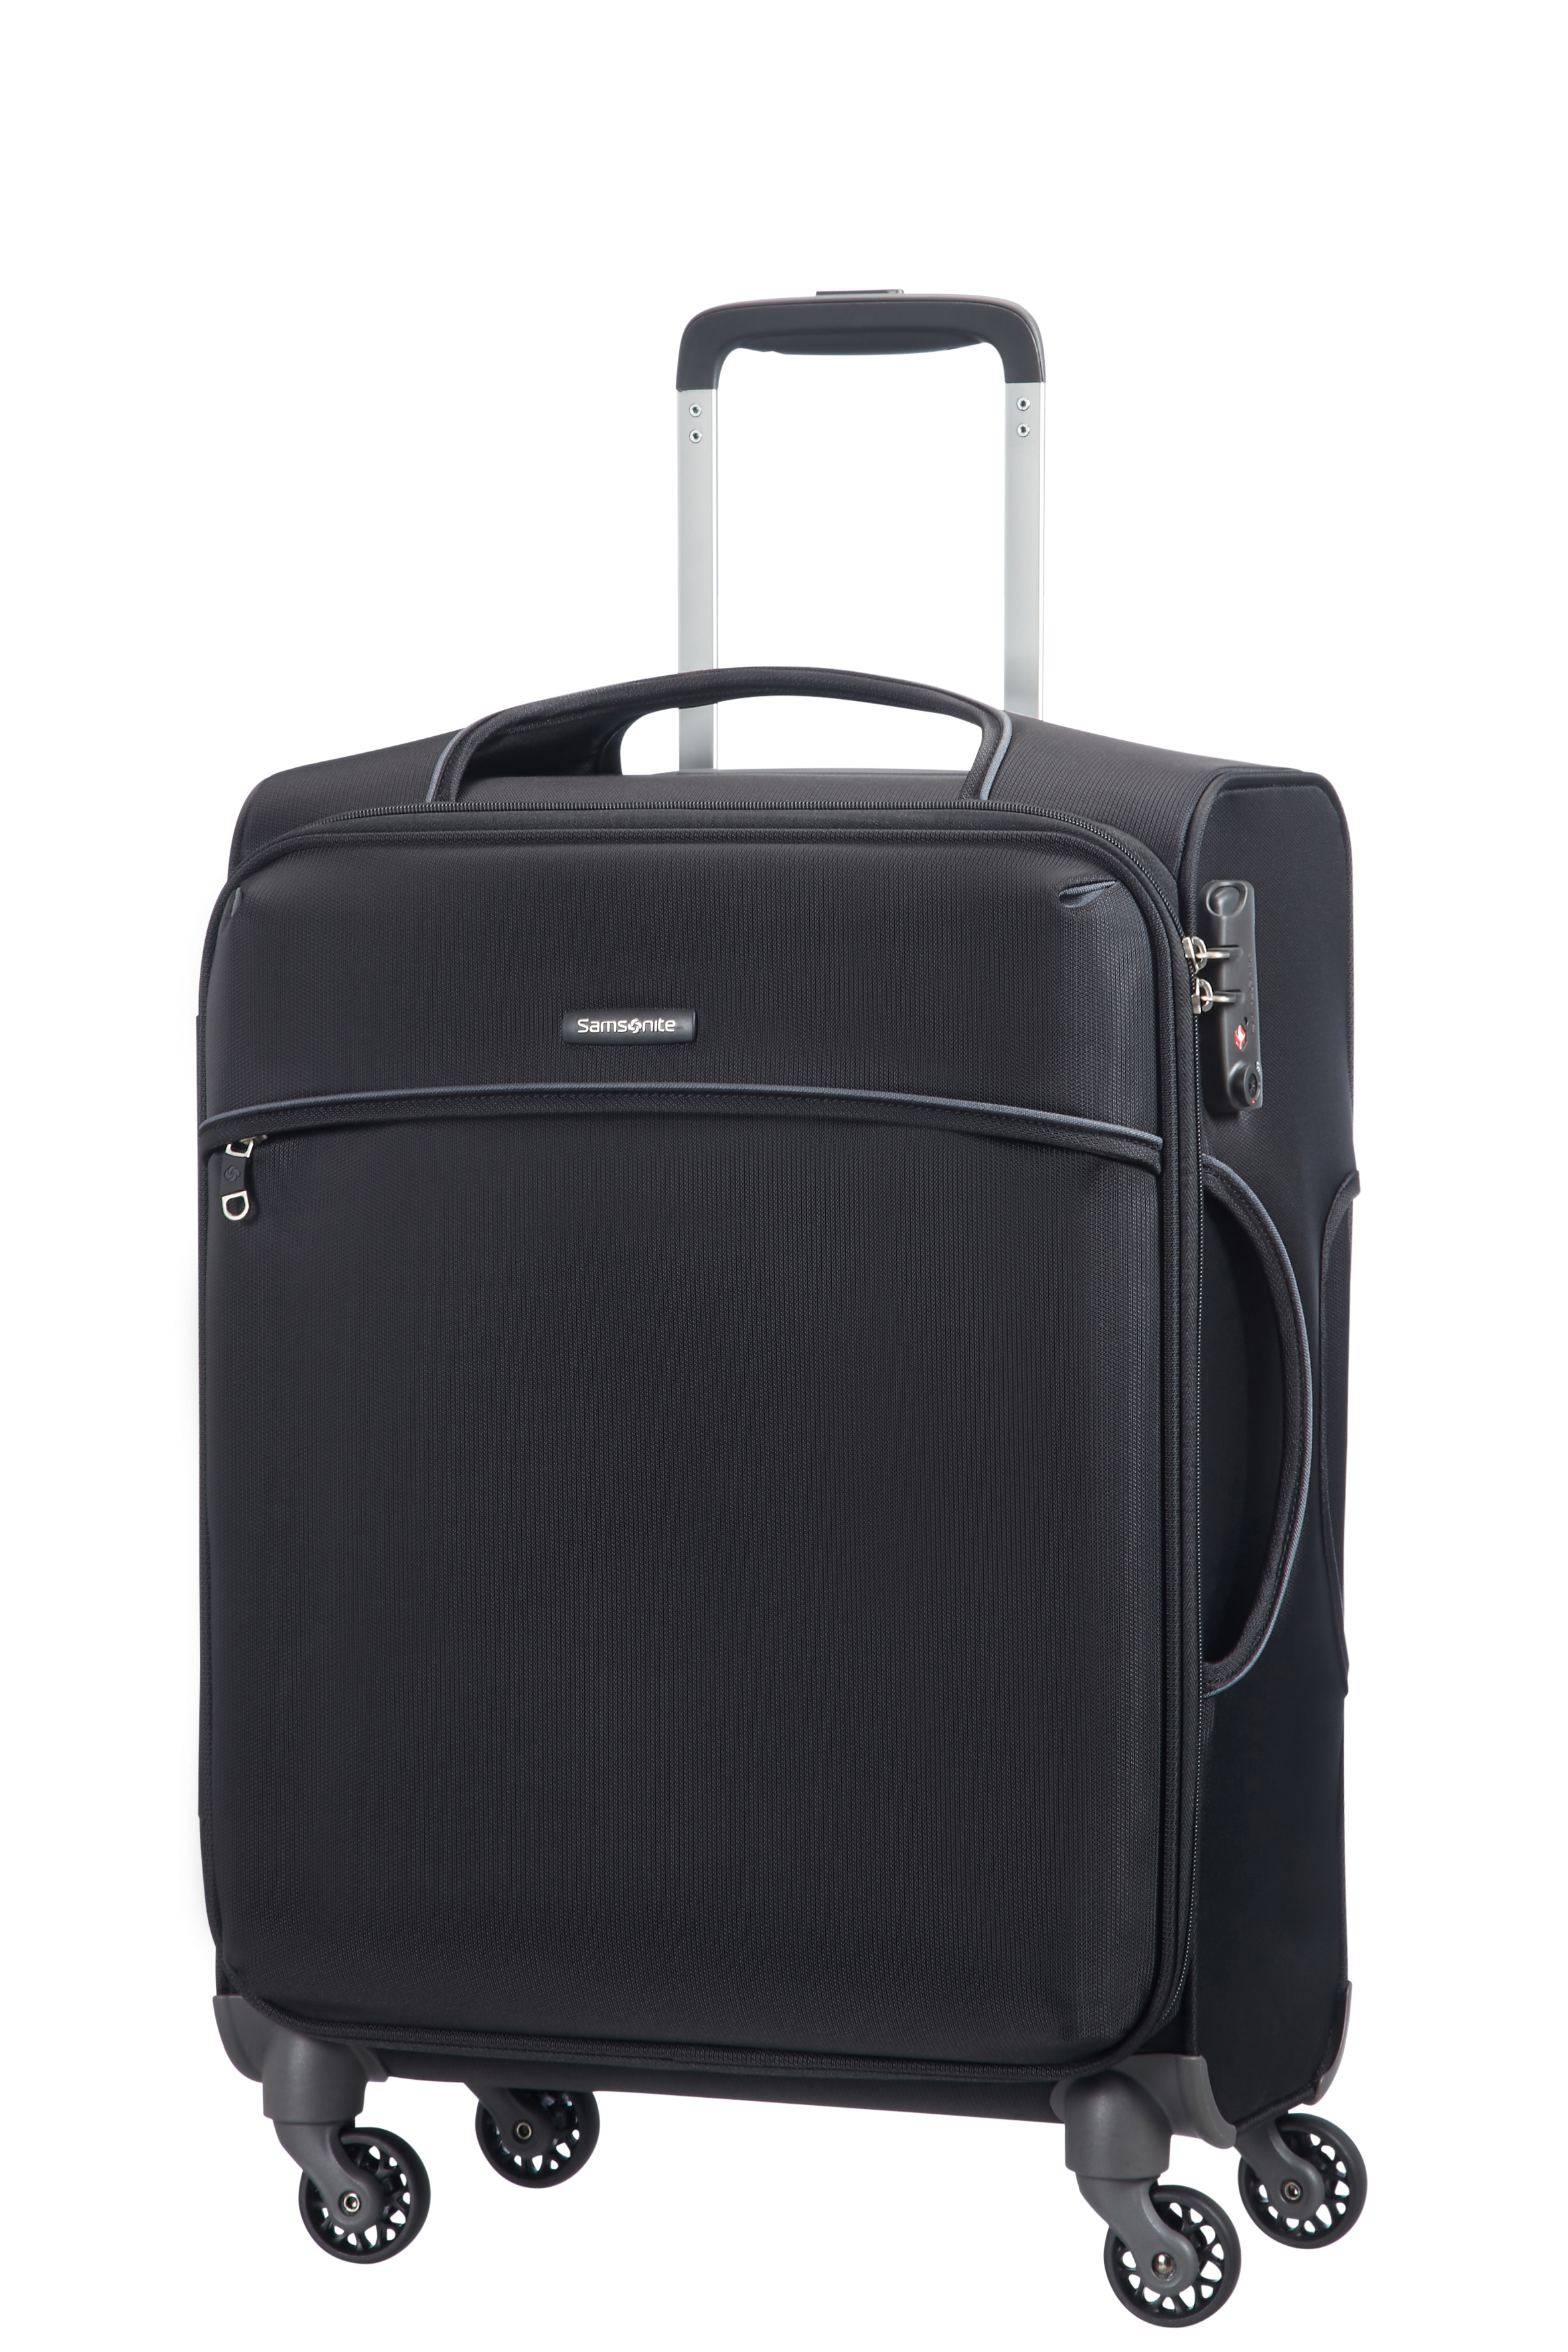 SAMSONITE - Βαλίτσα μεγάλου μεγέθους B-LITE FRESH SPINNER 83/31 μαύρη γυναικεία αξεσουάρ είδη ταξιδίου βαλίτσες μεγάλες